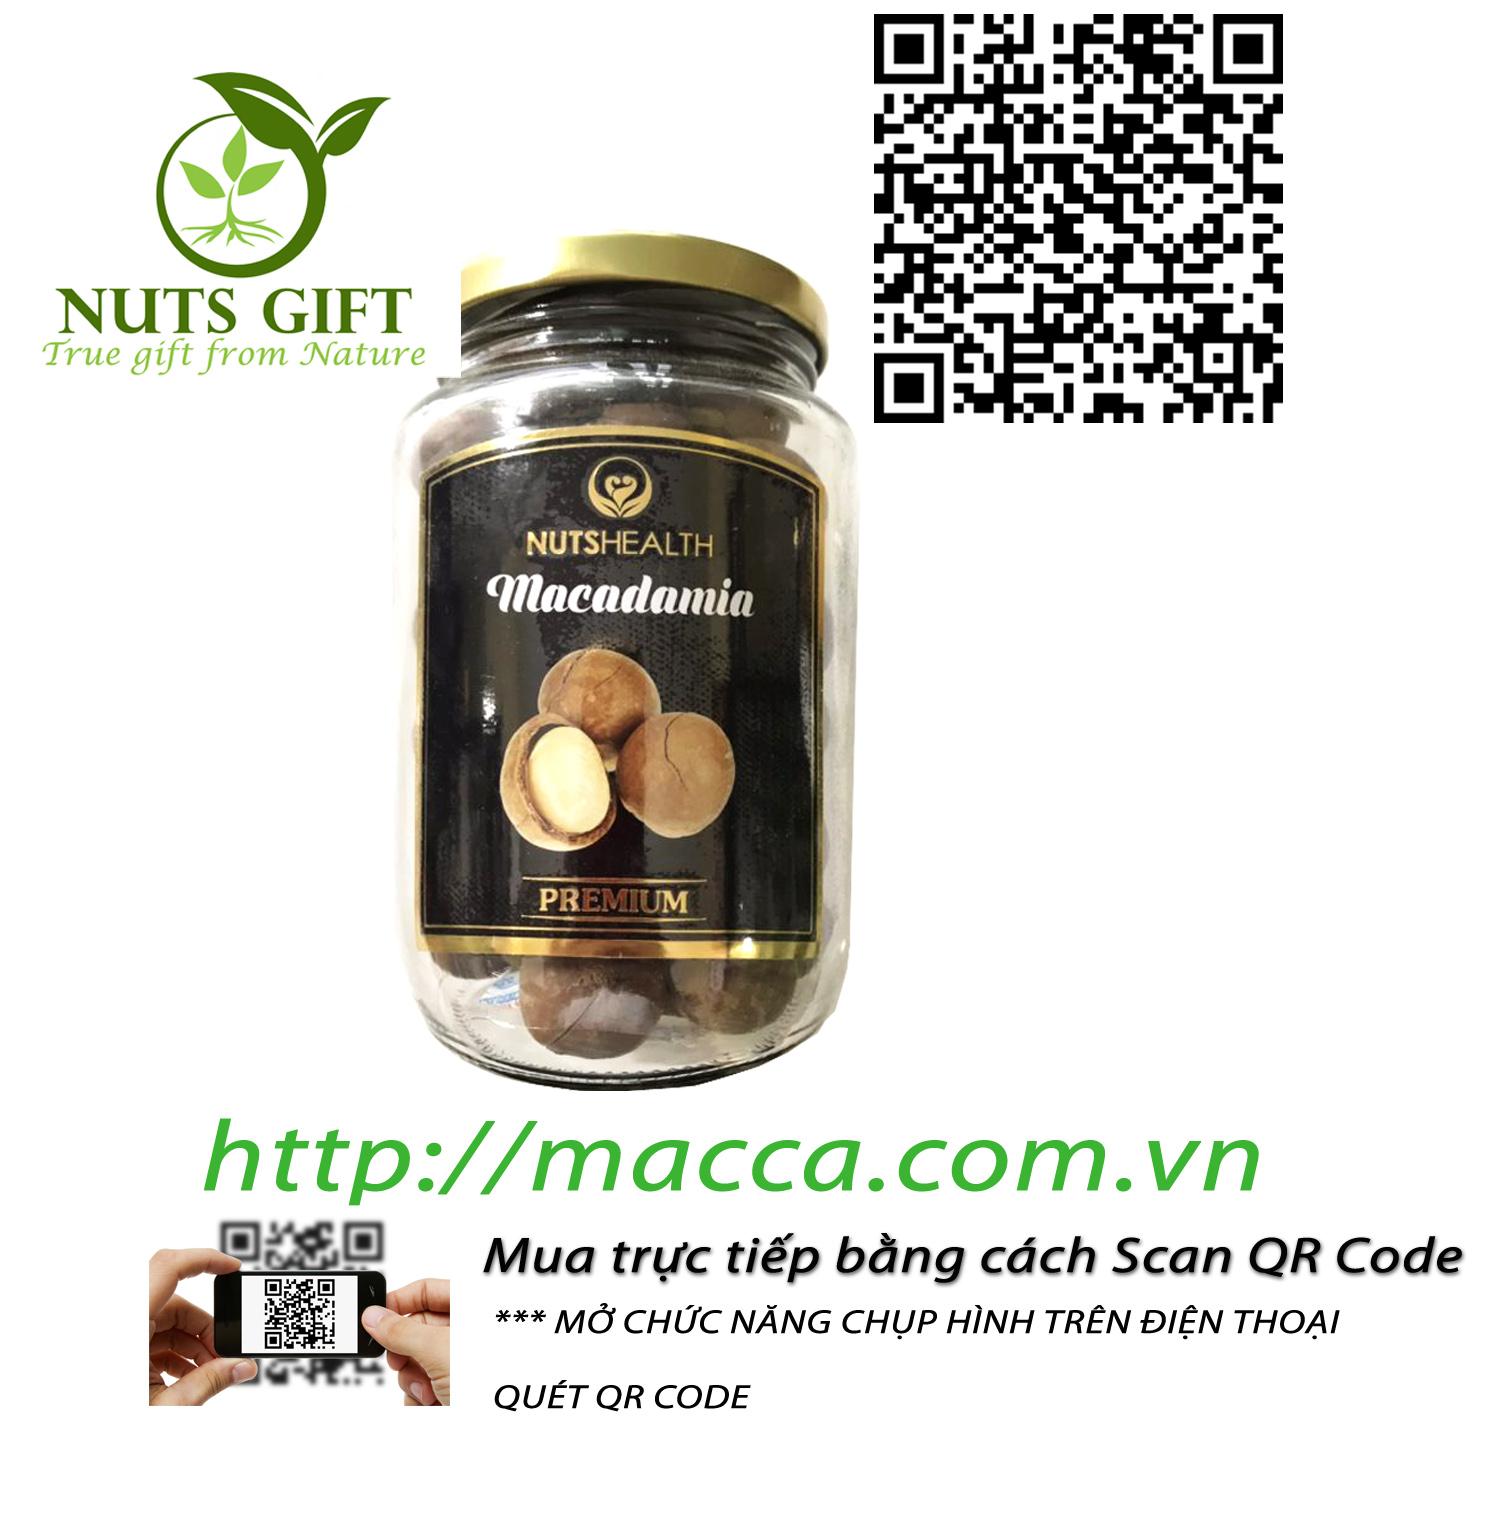 HẠT MẮC CA MACCA ÚC – NUTSHEALTH – 400 GR